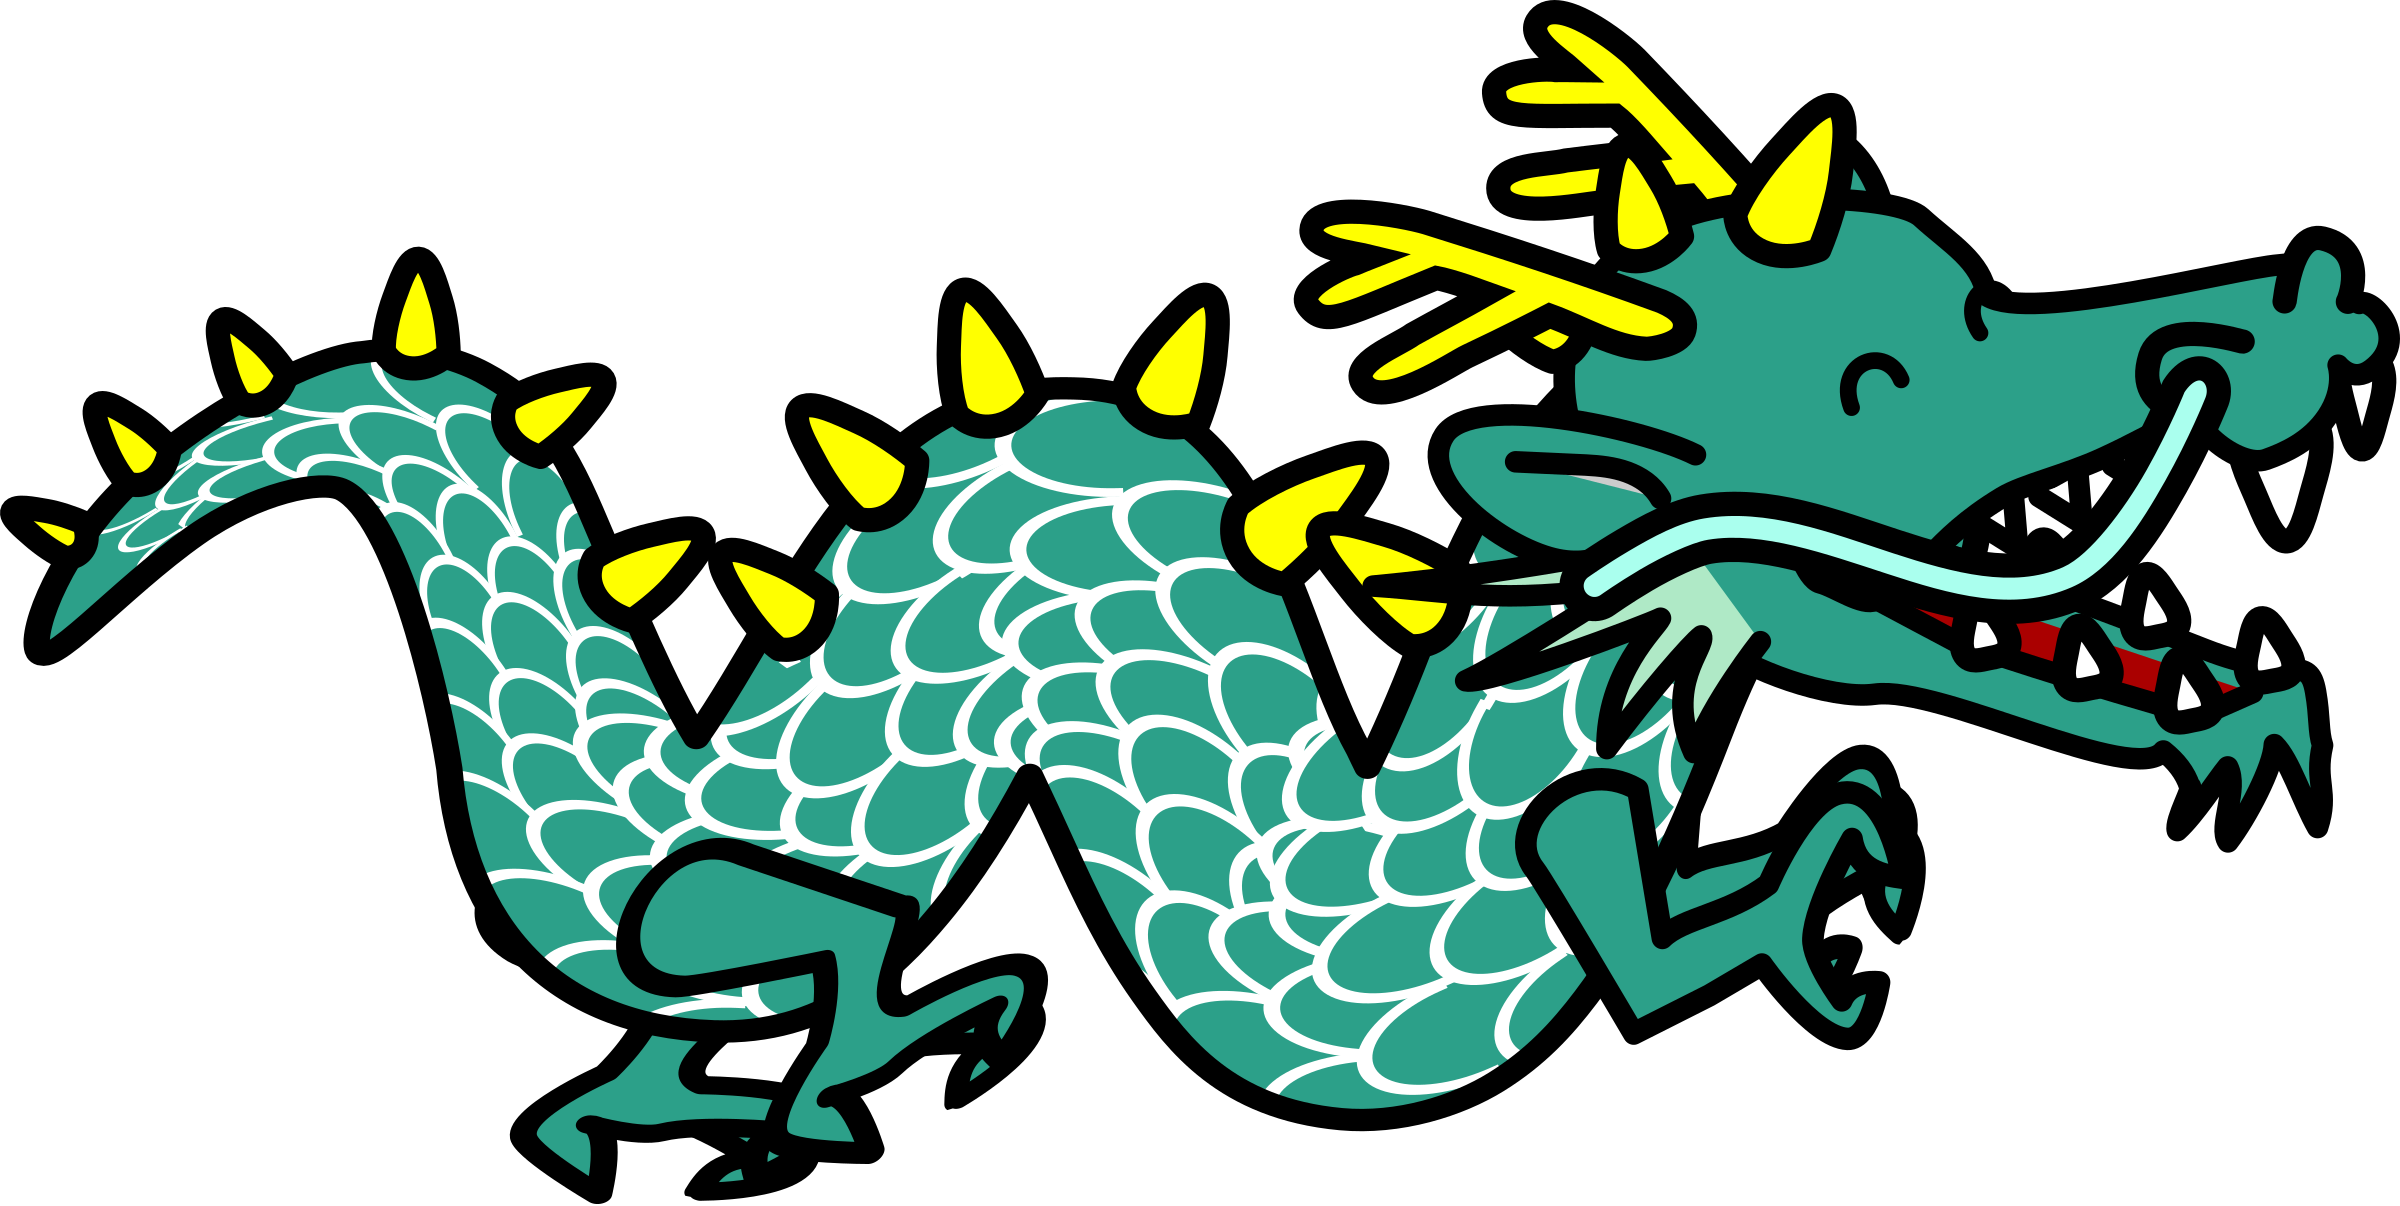 2400x1206 Dragon Clipart Images 101 Clip Art